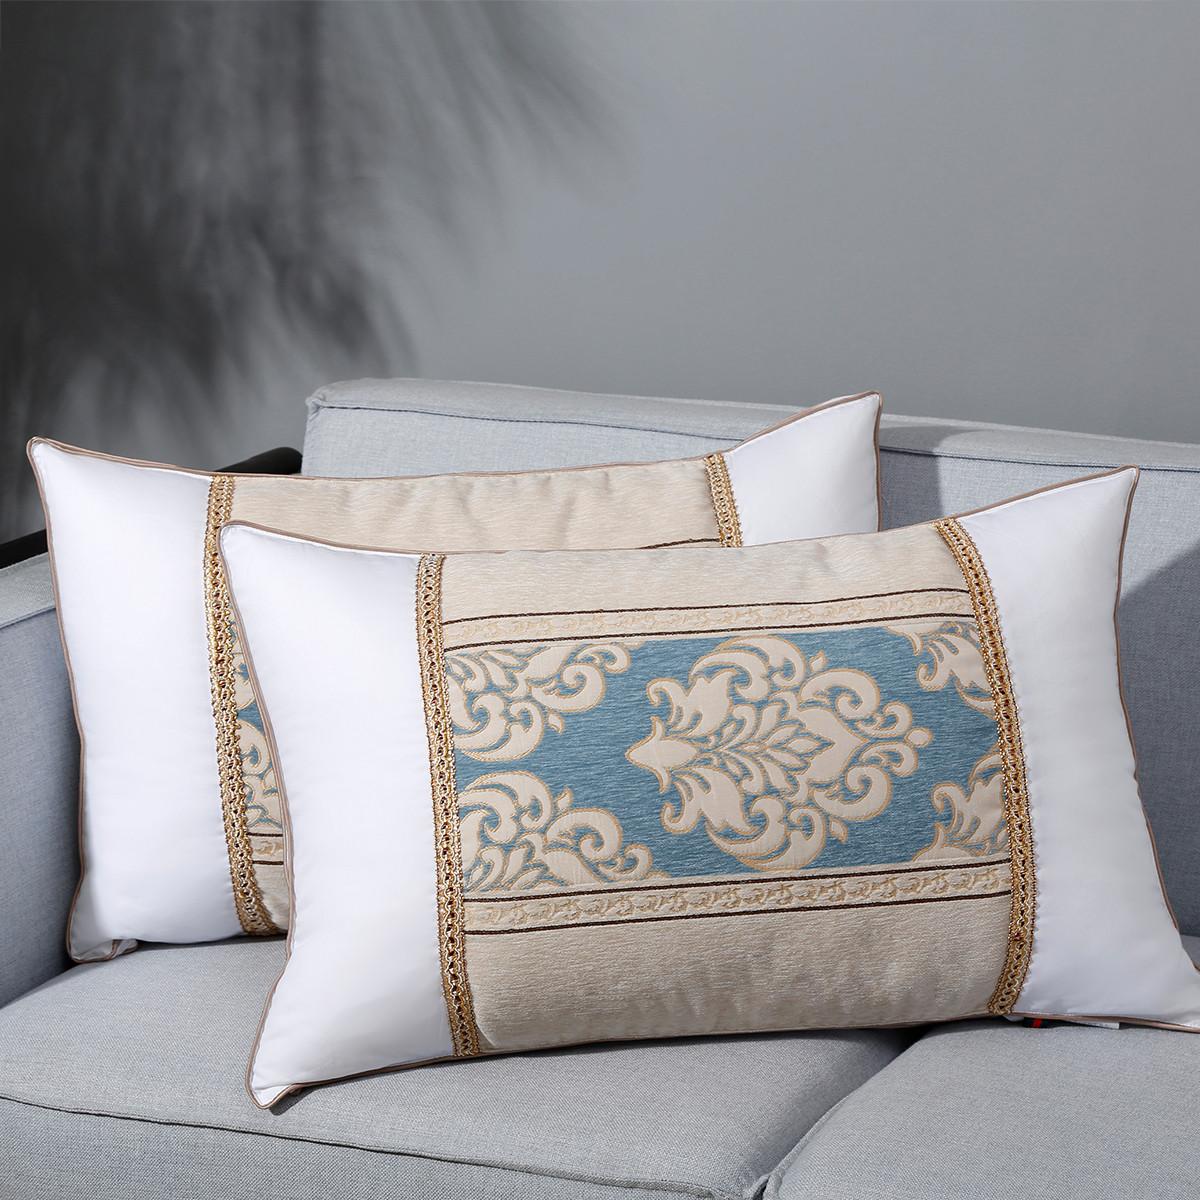 Ramada全棉床上用品枕头芯一对拍2成人护颈椎枕头纯棉枕头芯枕芯枕头COLOR白色(蓝边)